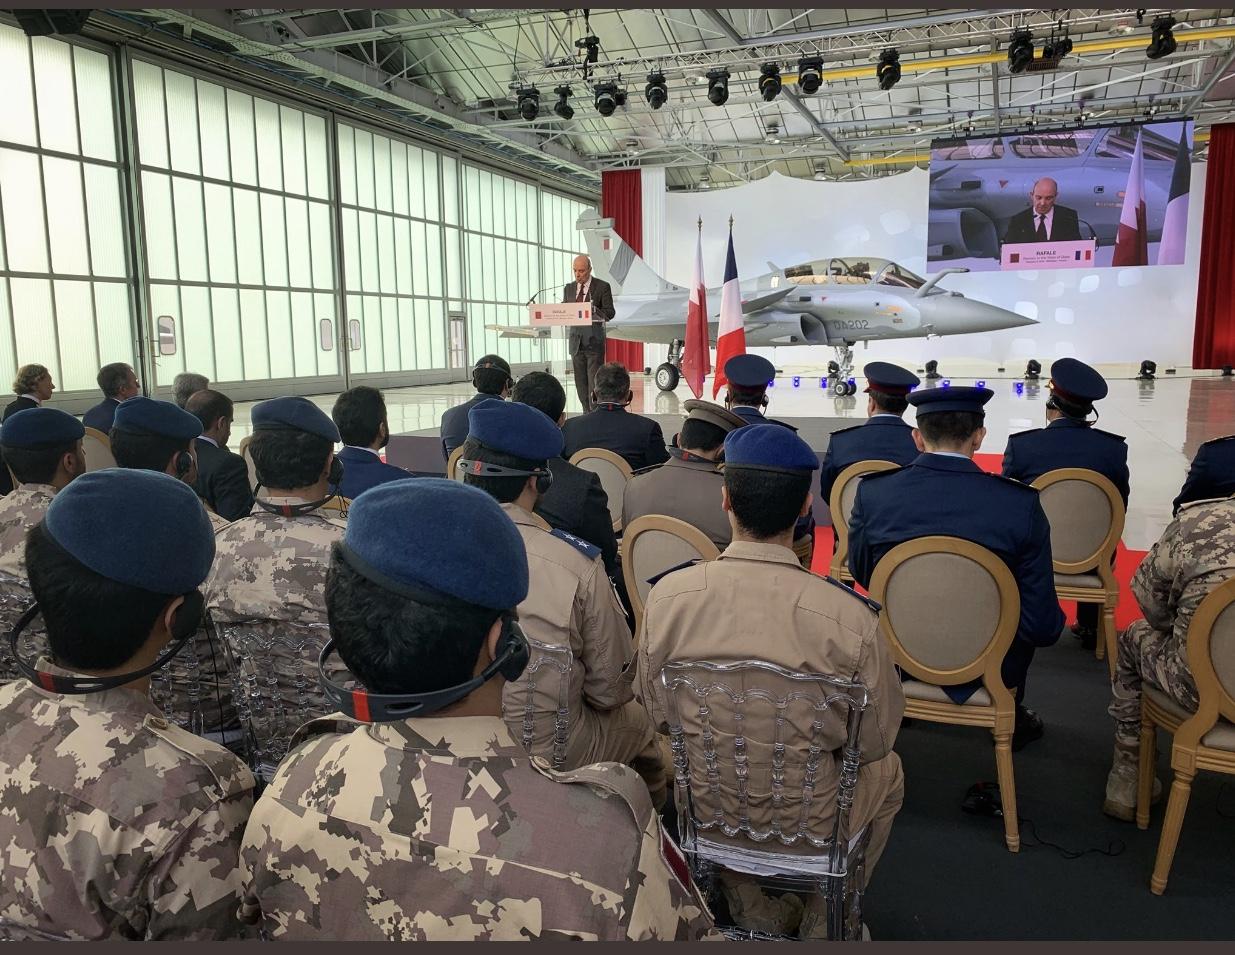 فرنسا تبيع قطر قريباً 36 طائرة رافال - صفحة 3 F7533f52-e768-422a-9c72-df35049e00a4-jpeg